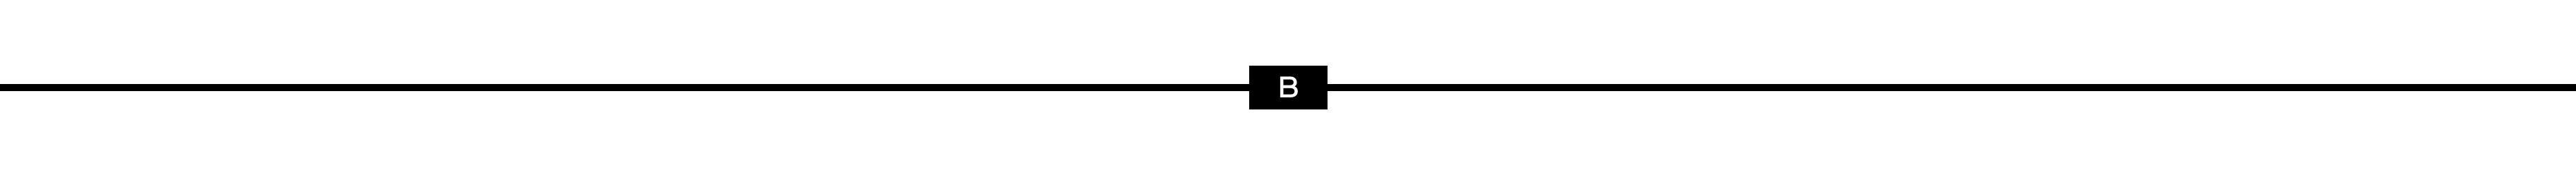 Bowtie_Black_RGB